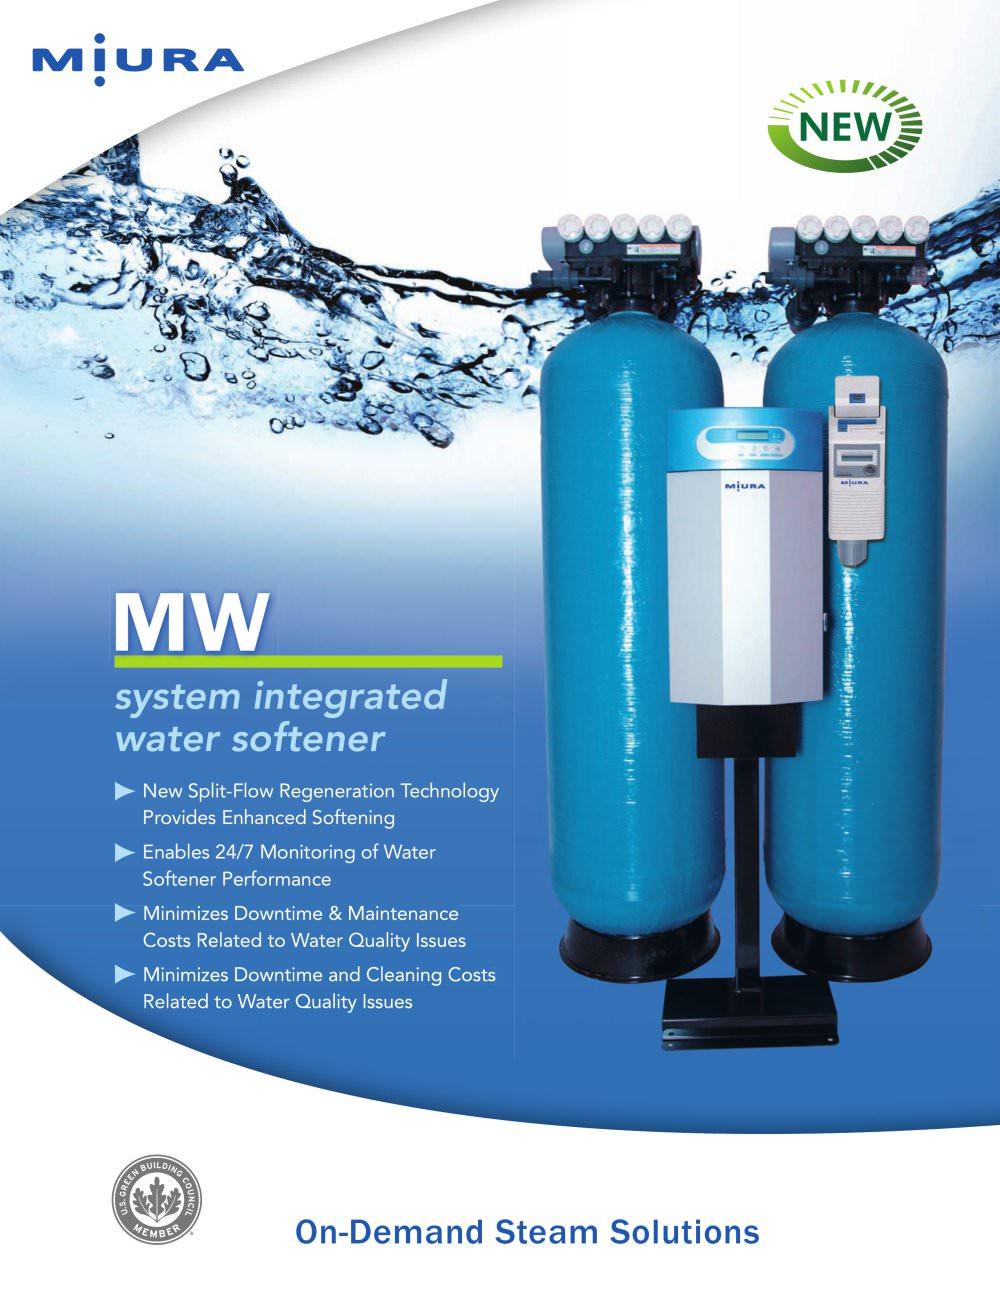 Miura MW brochure - Miura Boiler - PDF Catalogue | Technical ...